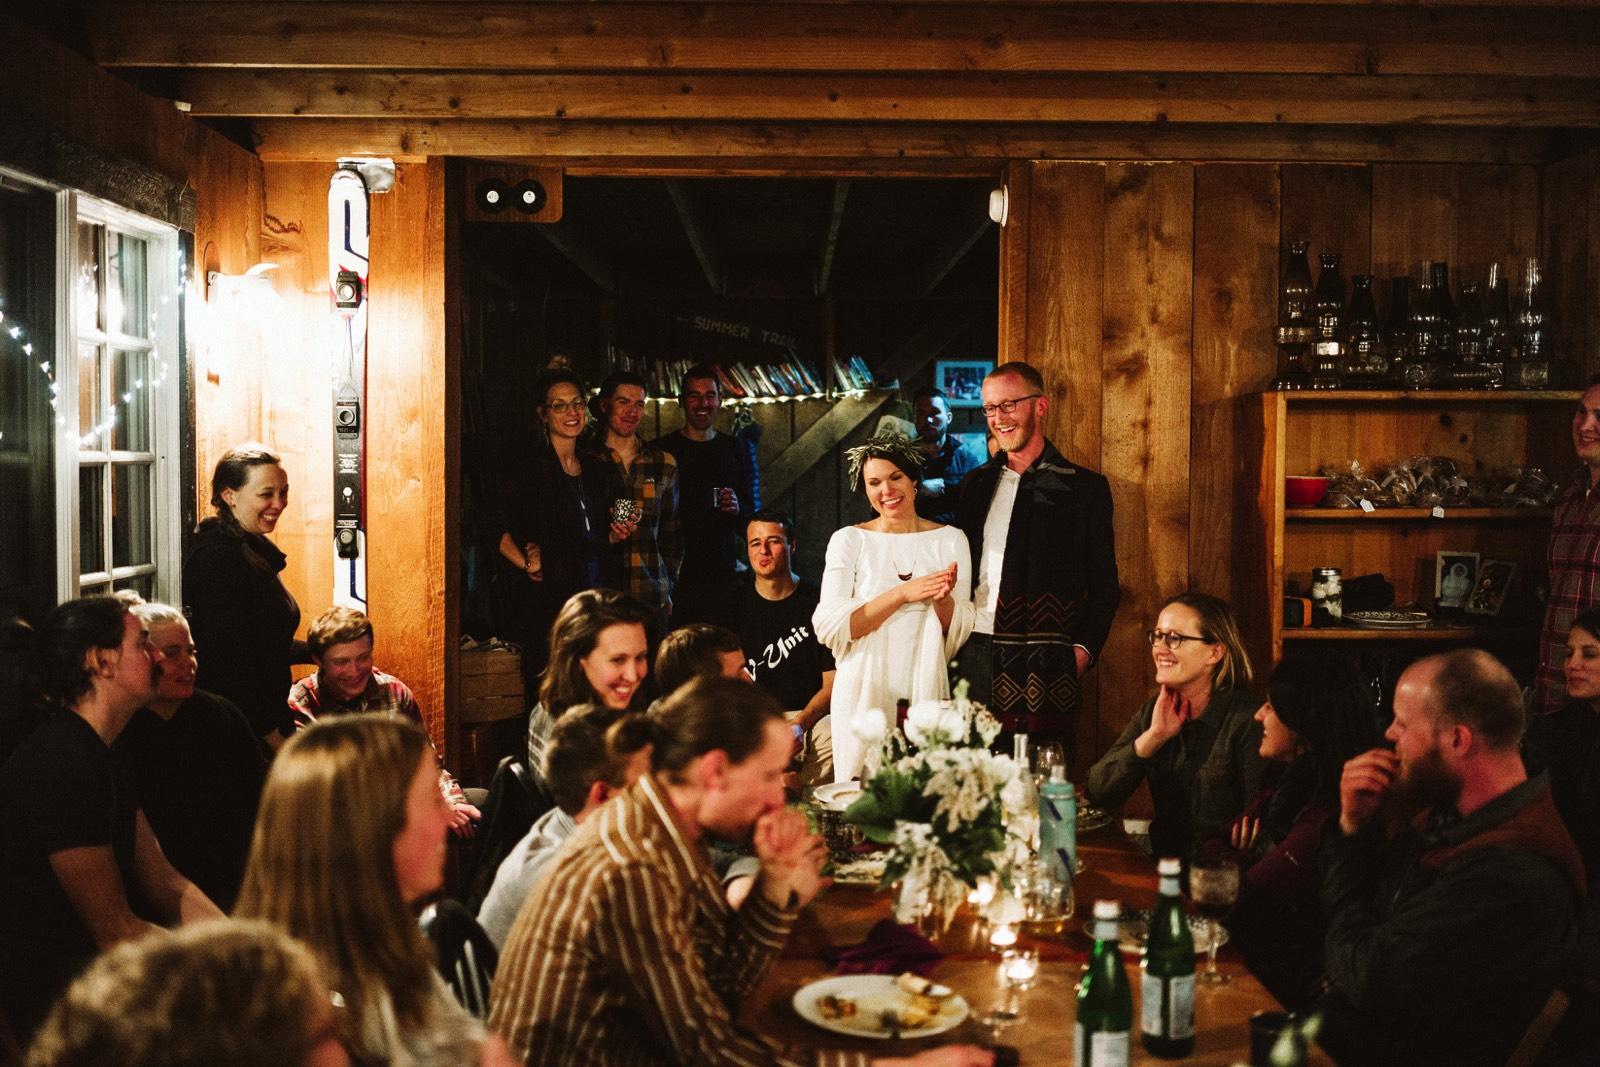 alpine-lakes-high-camp-winter-wedding-88 ALPINE LAKES HIGH CAMP WEDDING